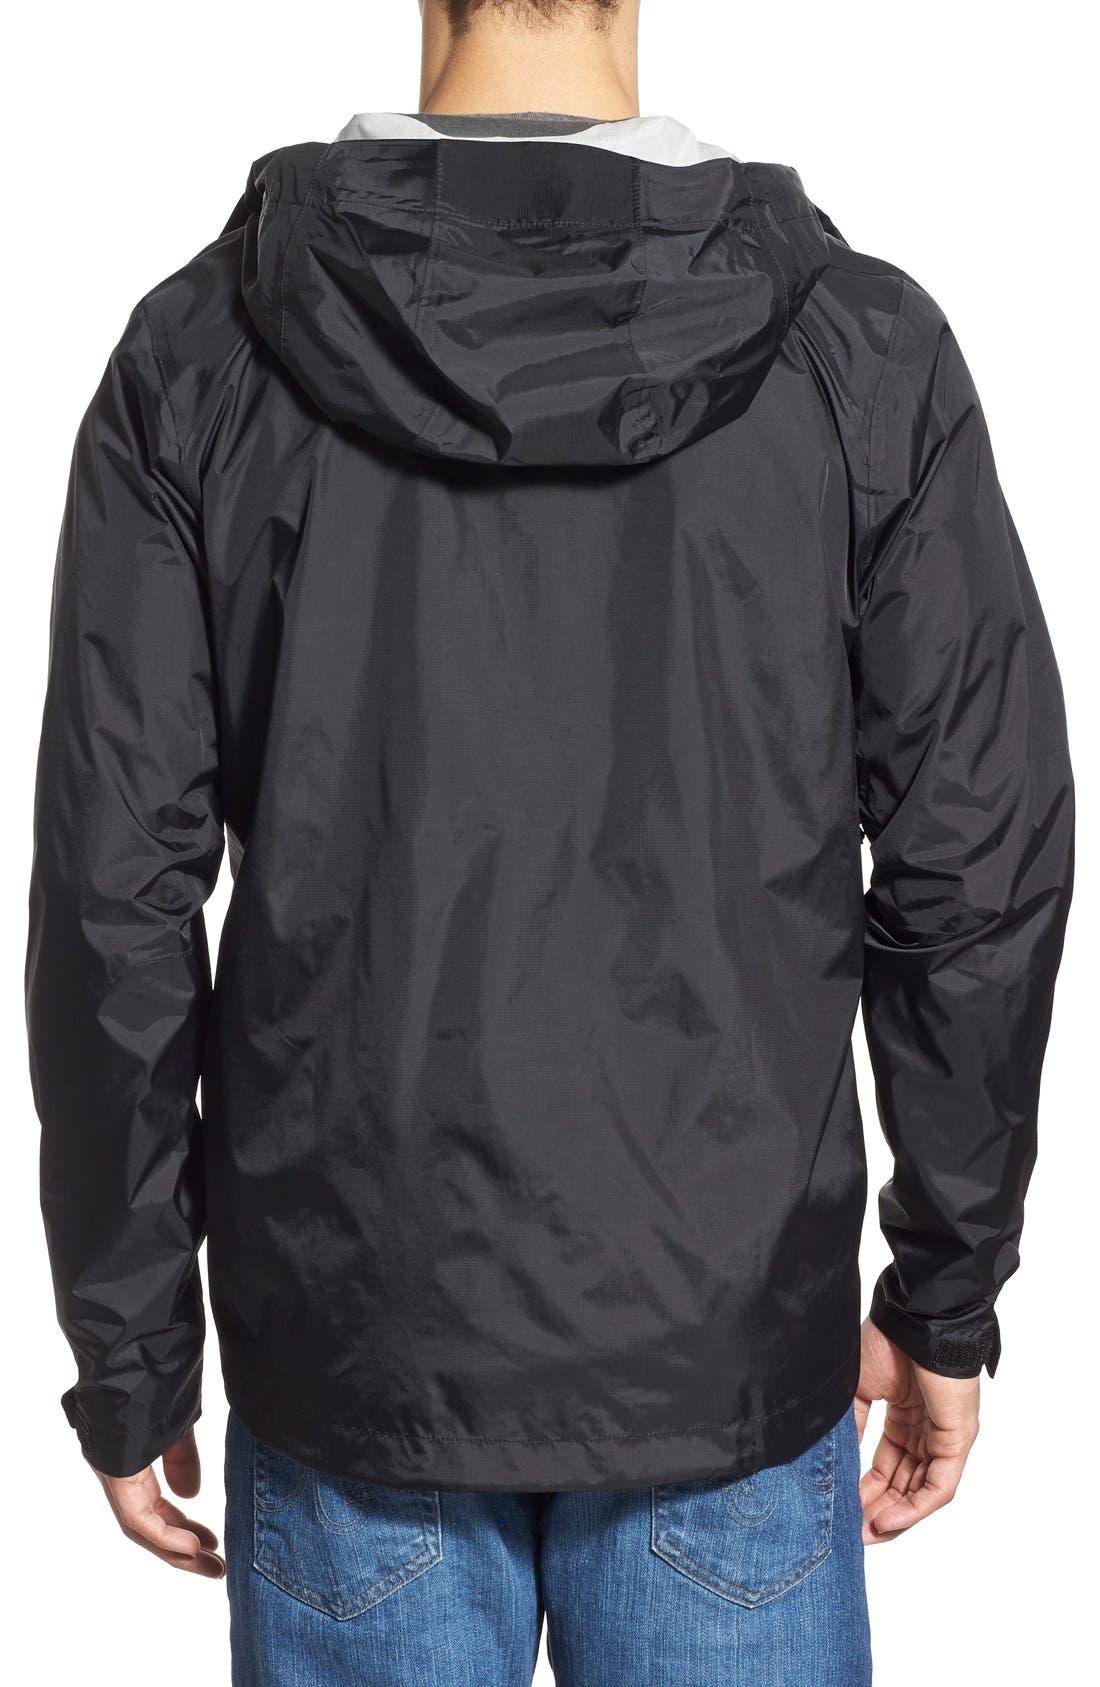 'Torrentshell' Packable Rain Jacket,                             Alternate thumbnail 2, color,                             Black